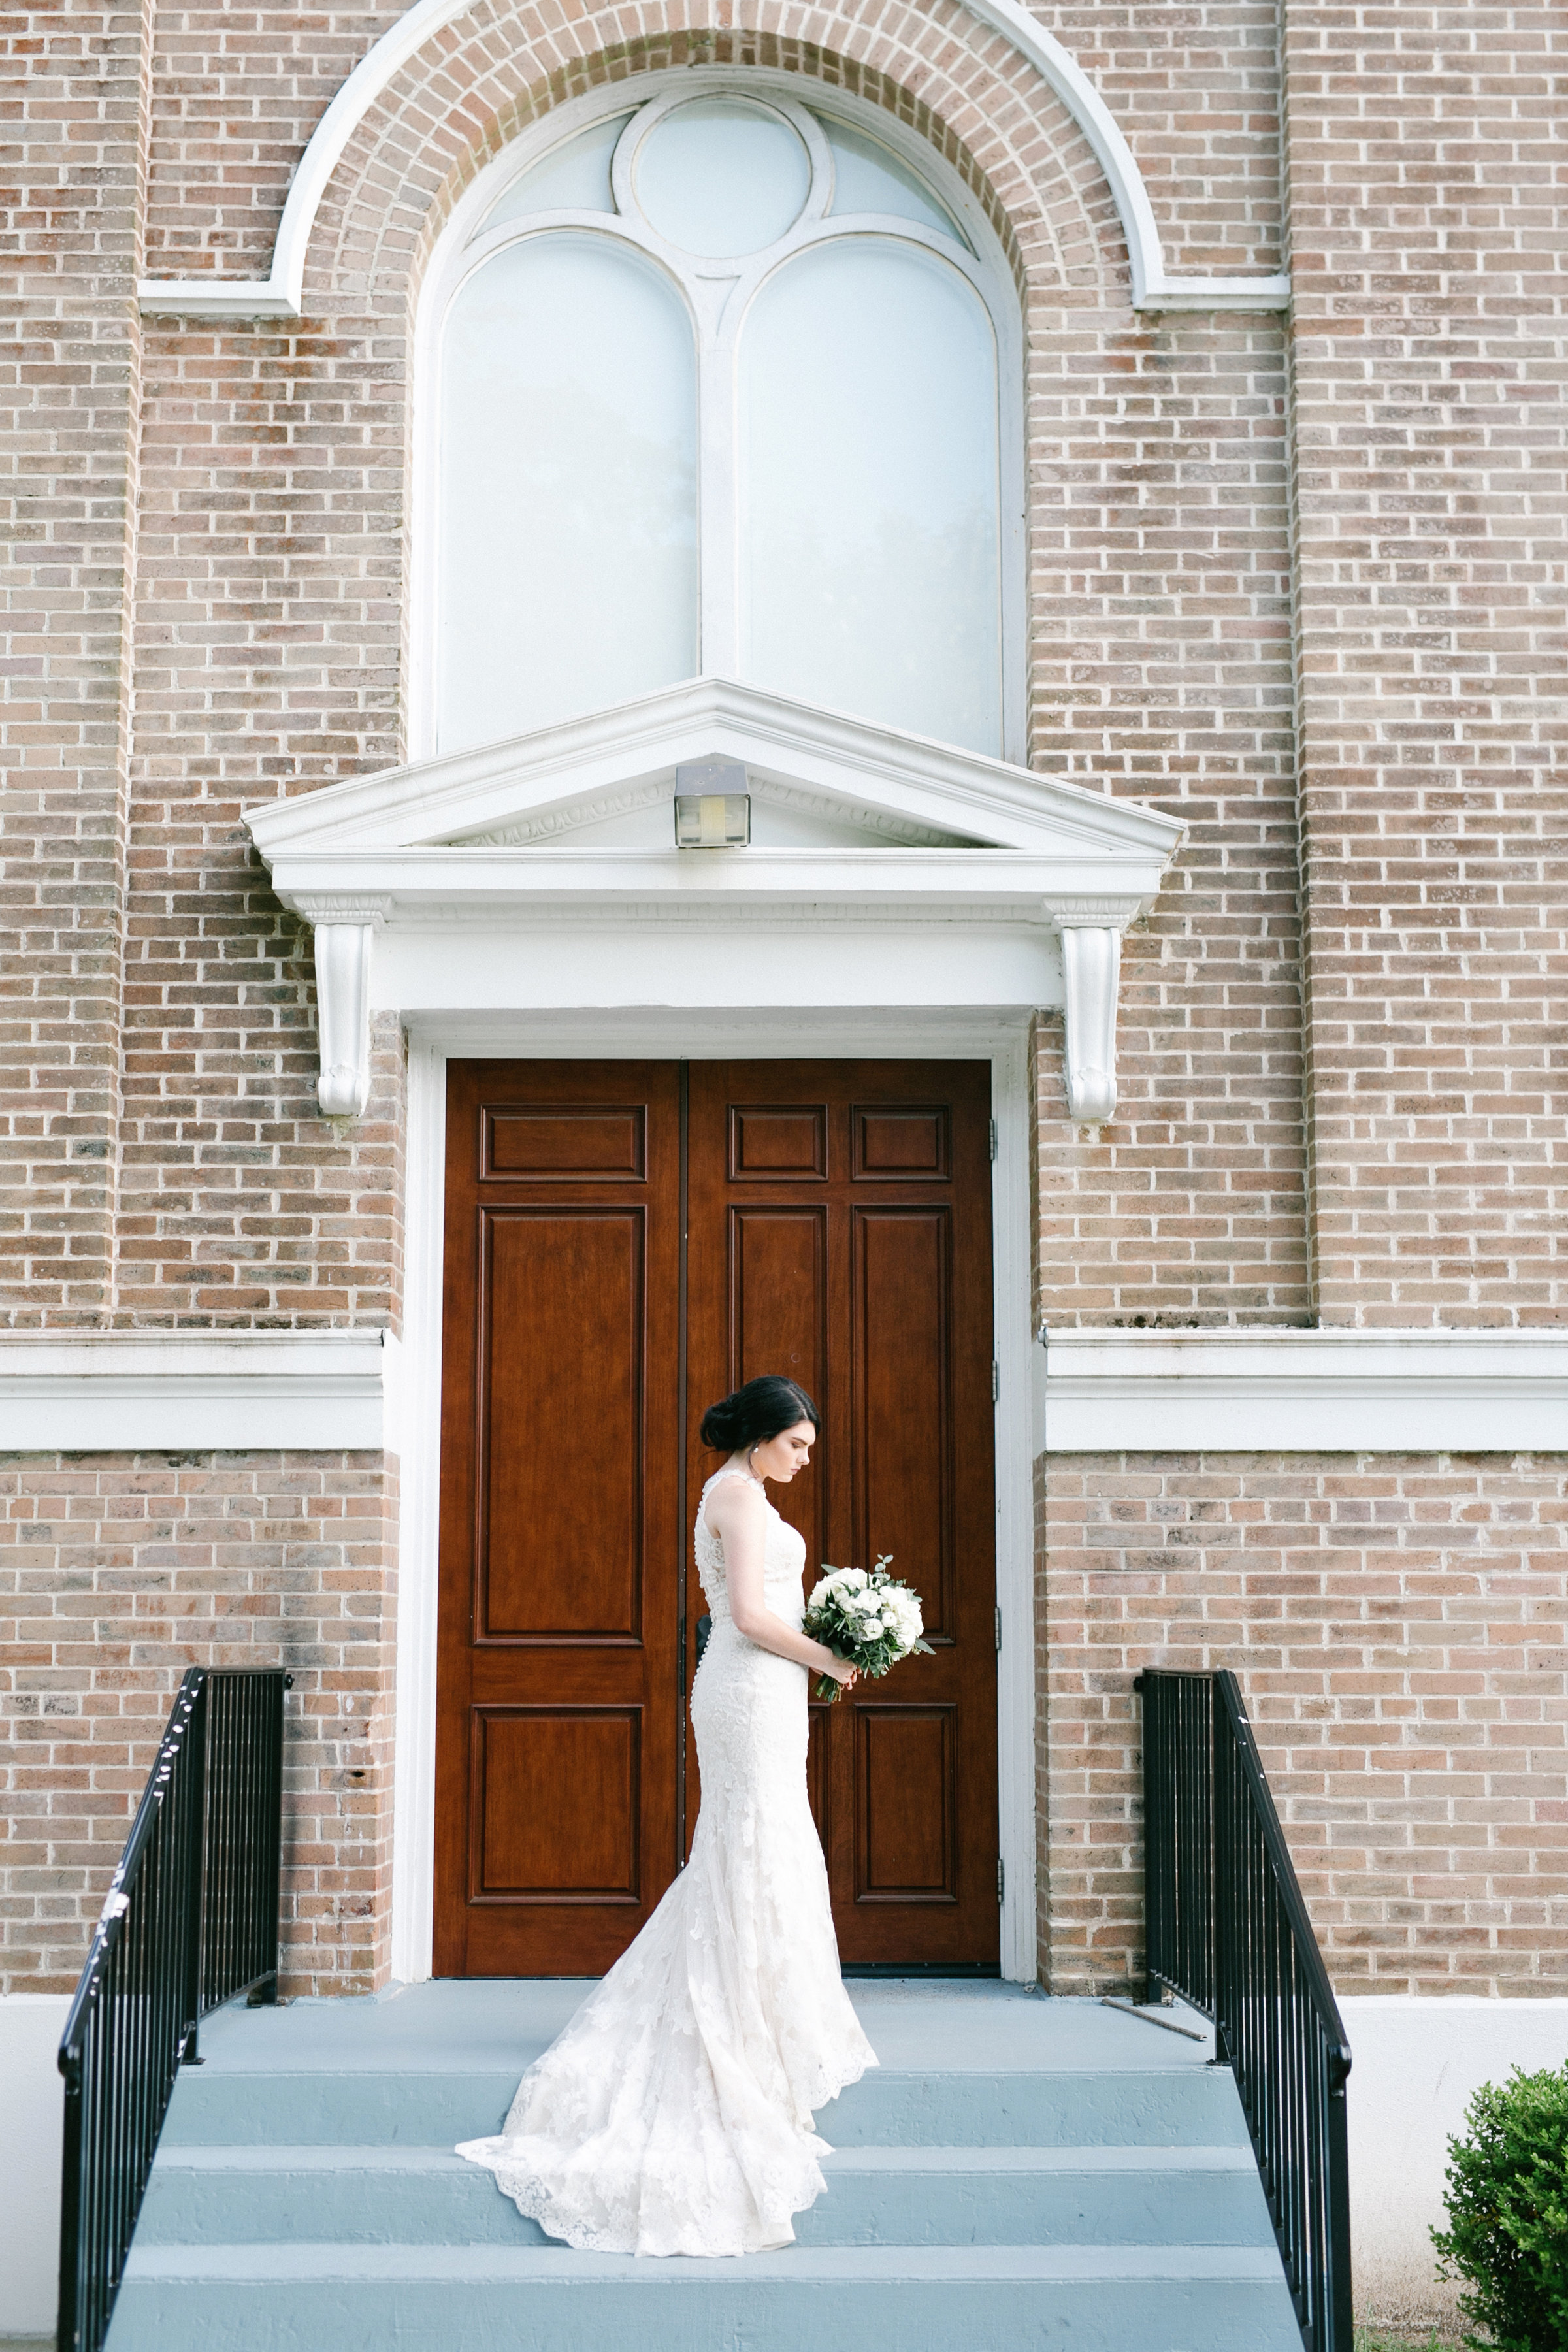 Molly_Bridal-32.jpg